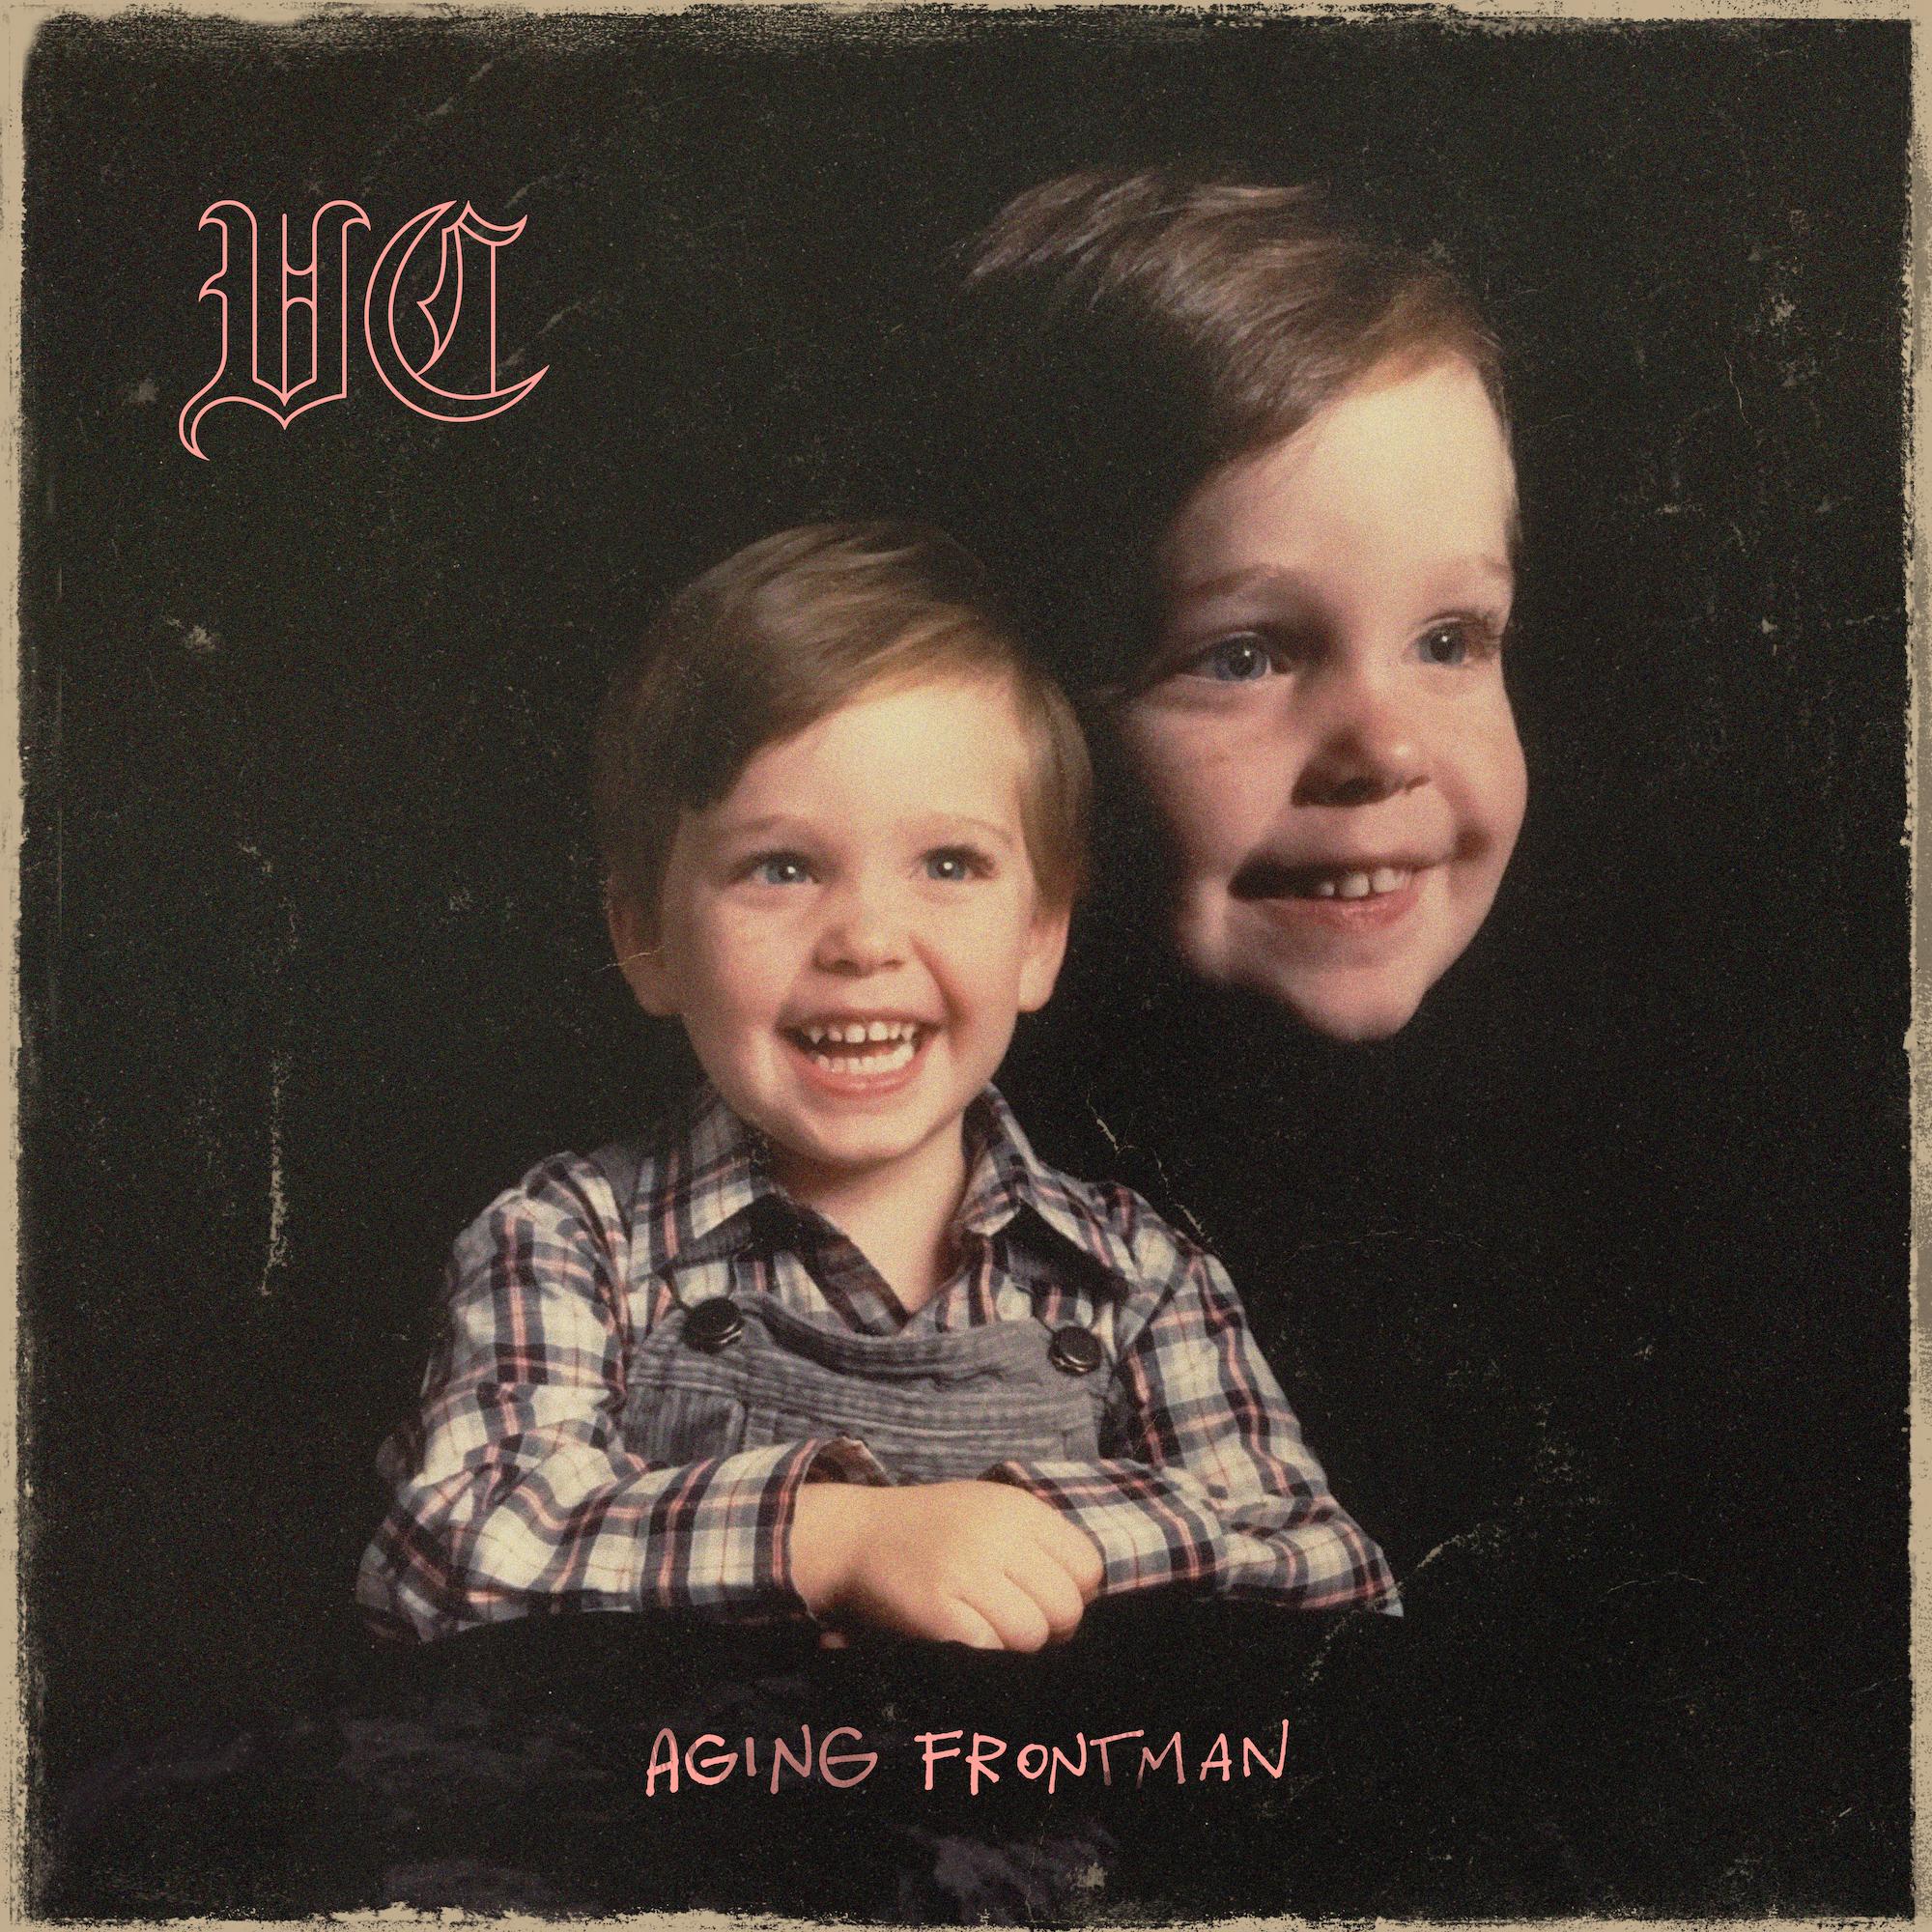 VC - AGING FRONTMAN DIGITAL COVER.jpg